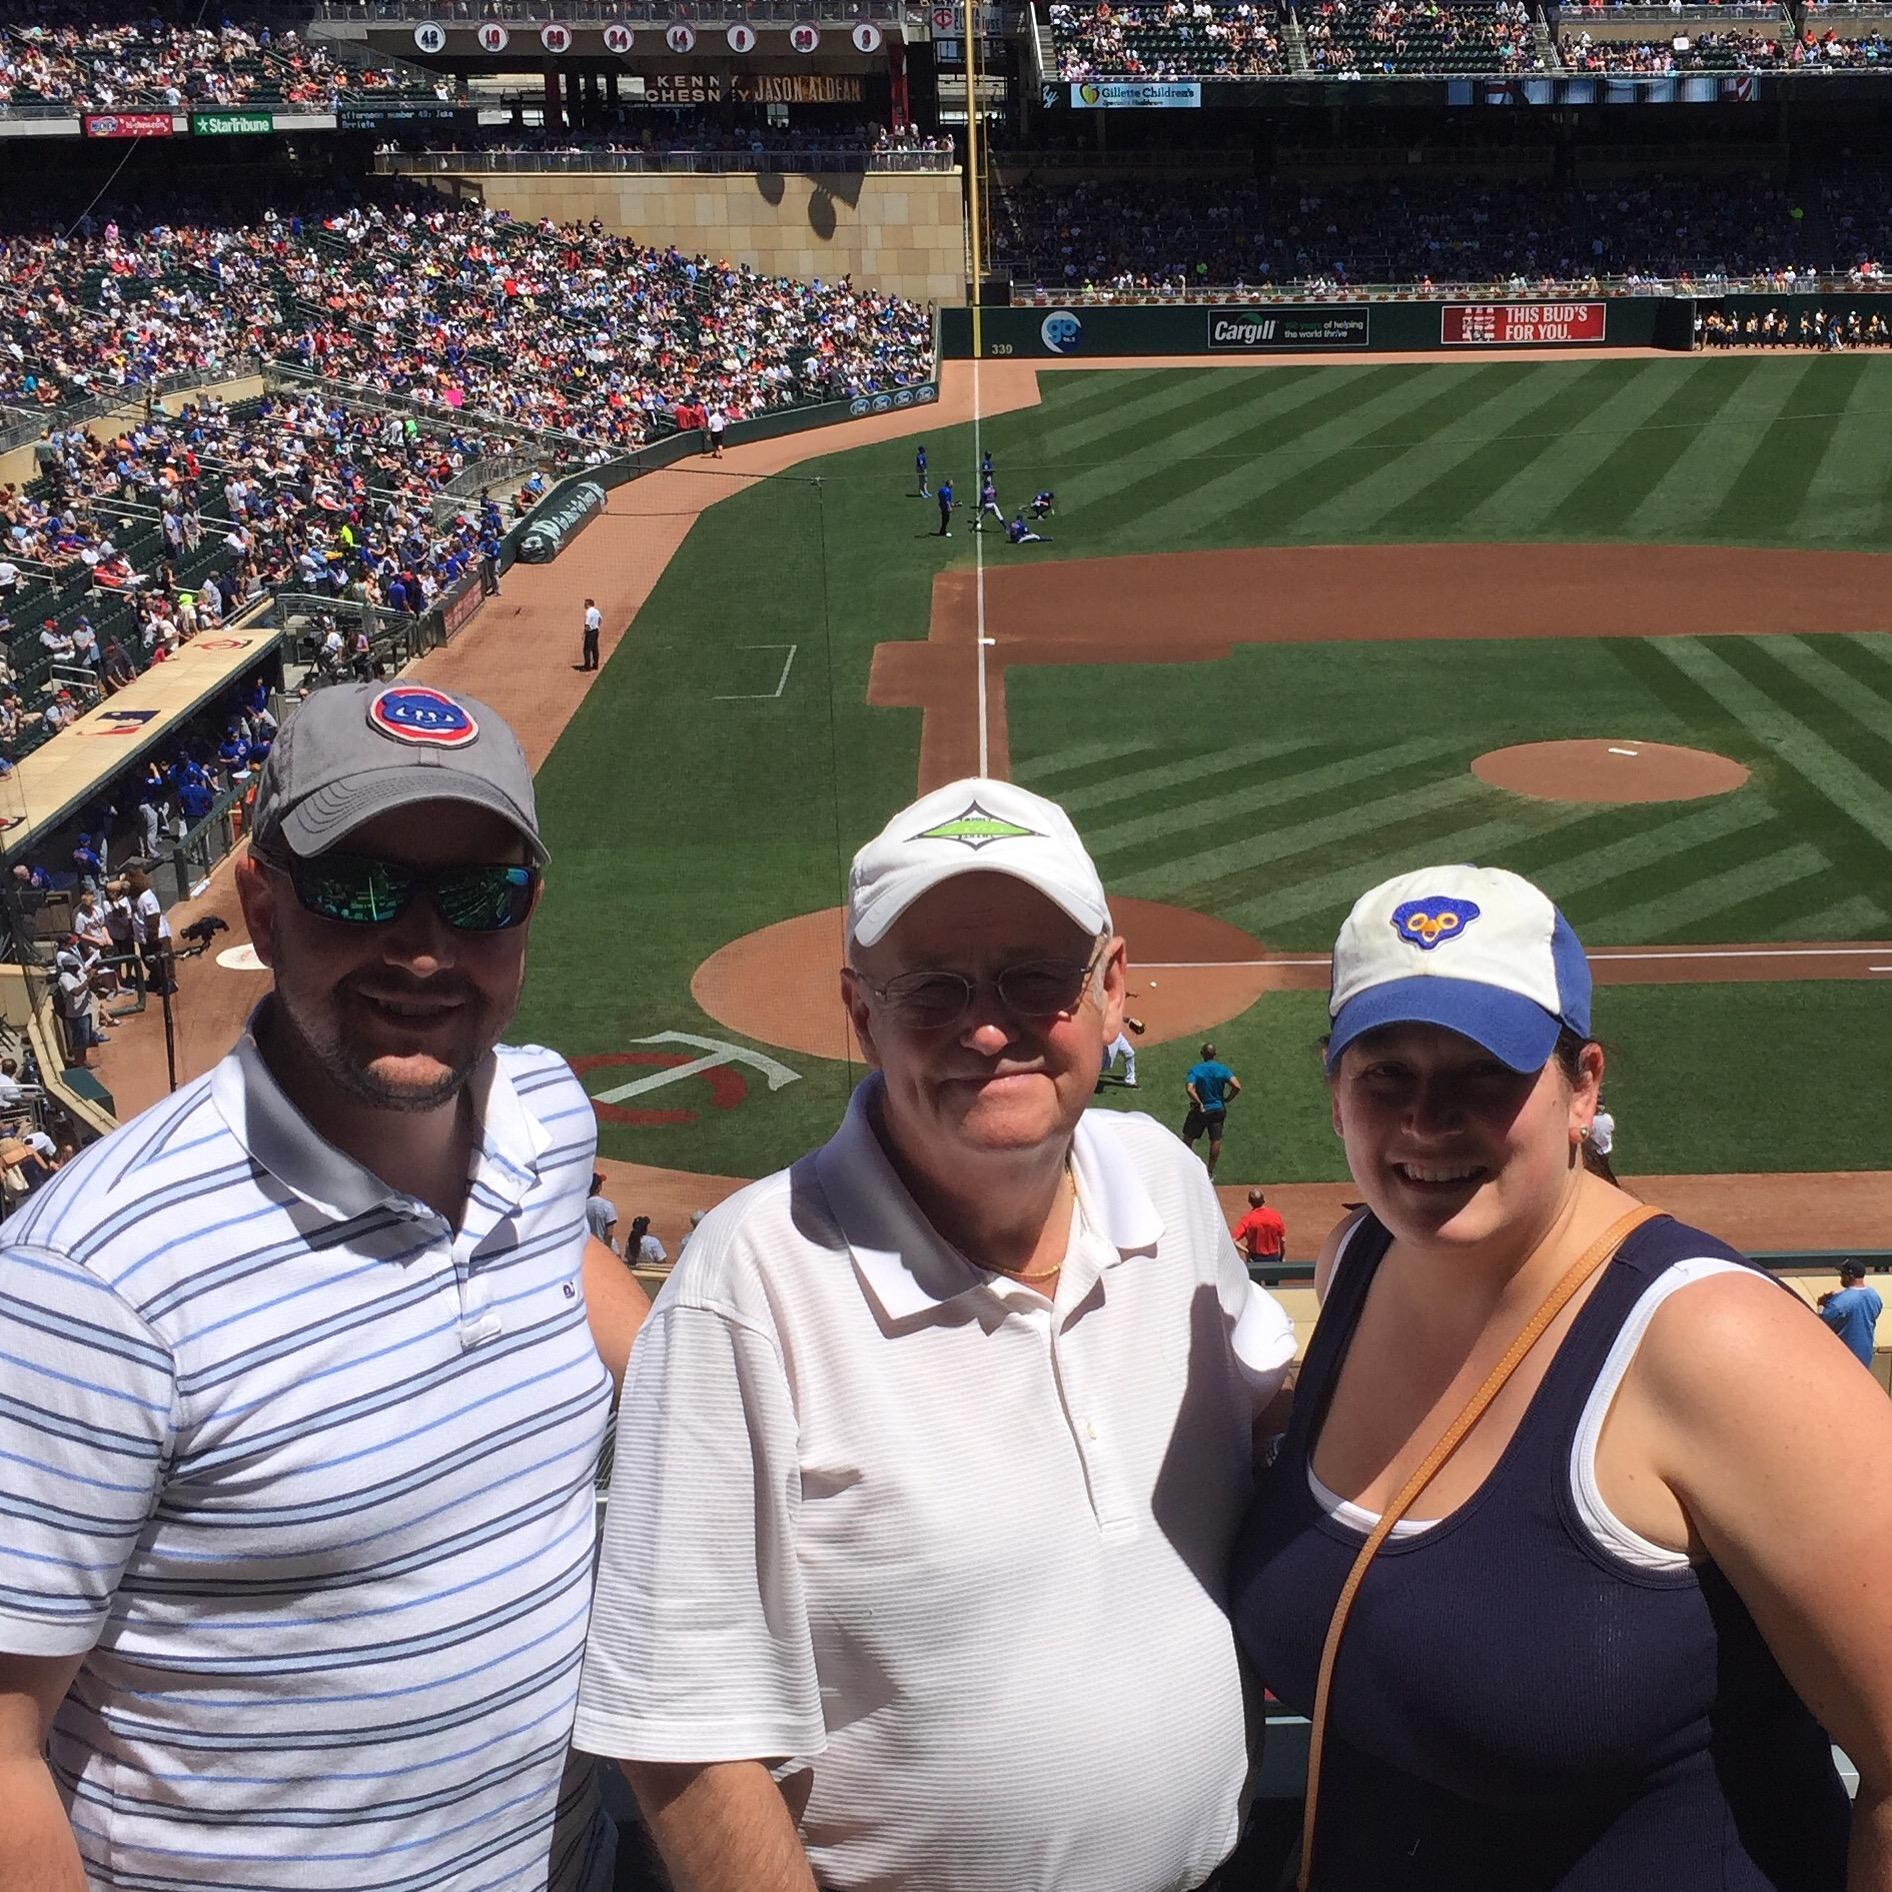 Twins vs. Cubs baseball rivalry